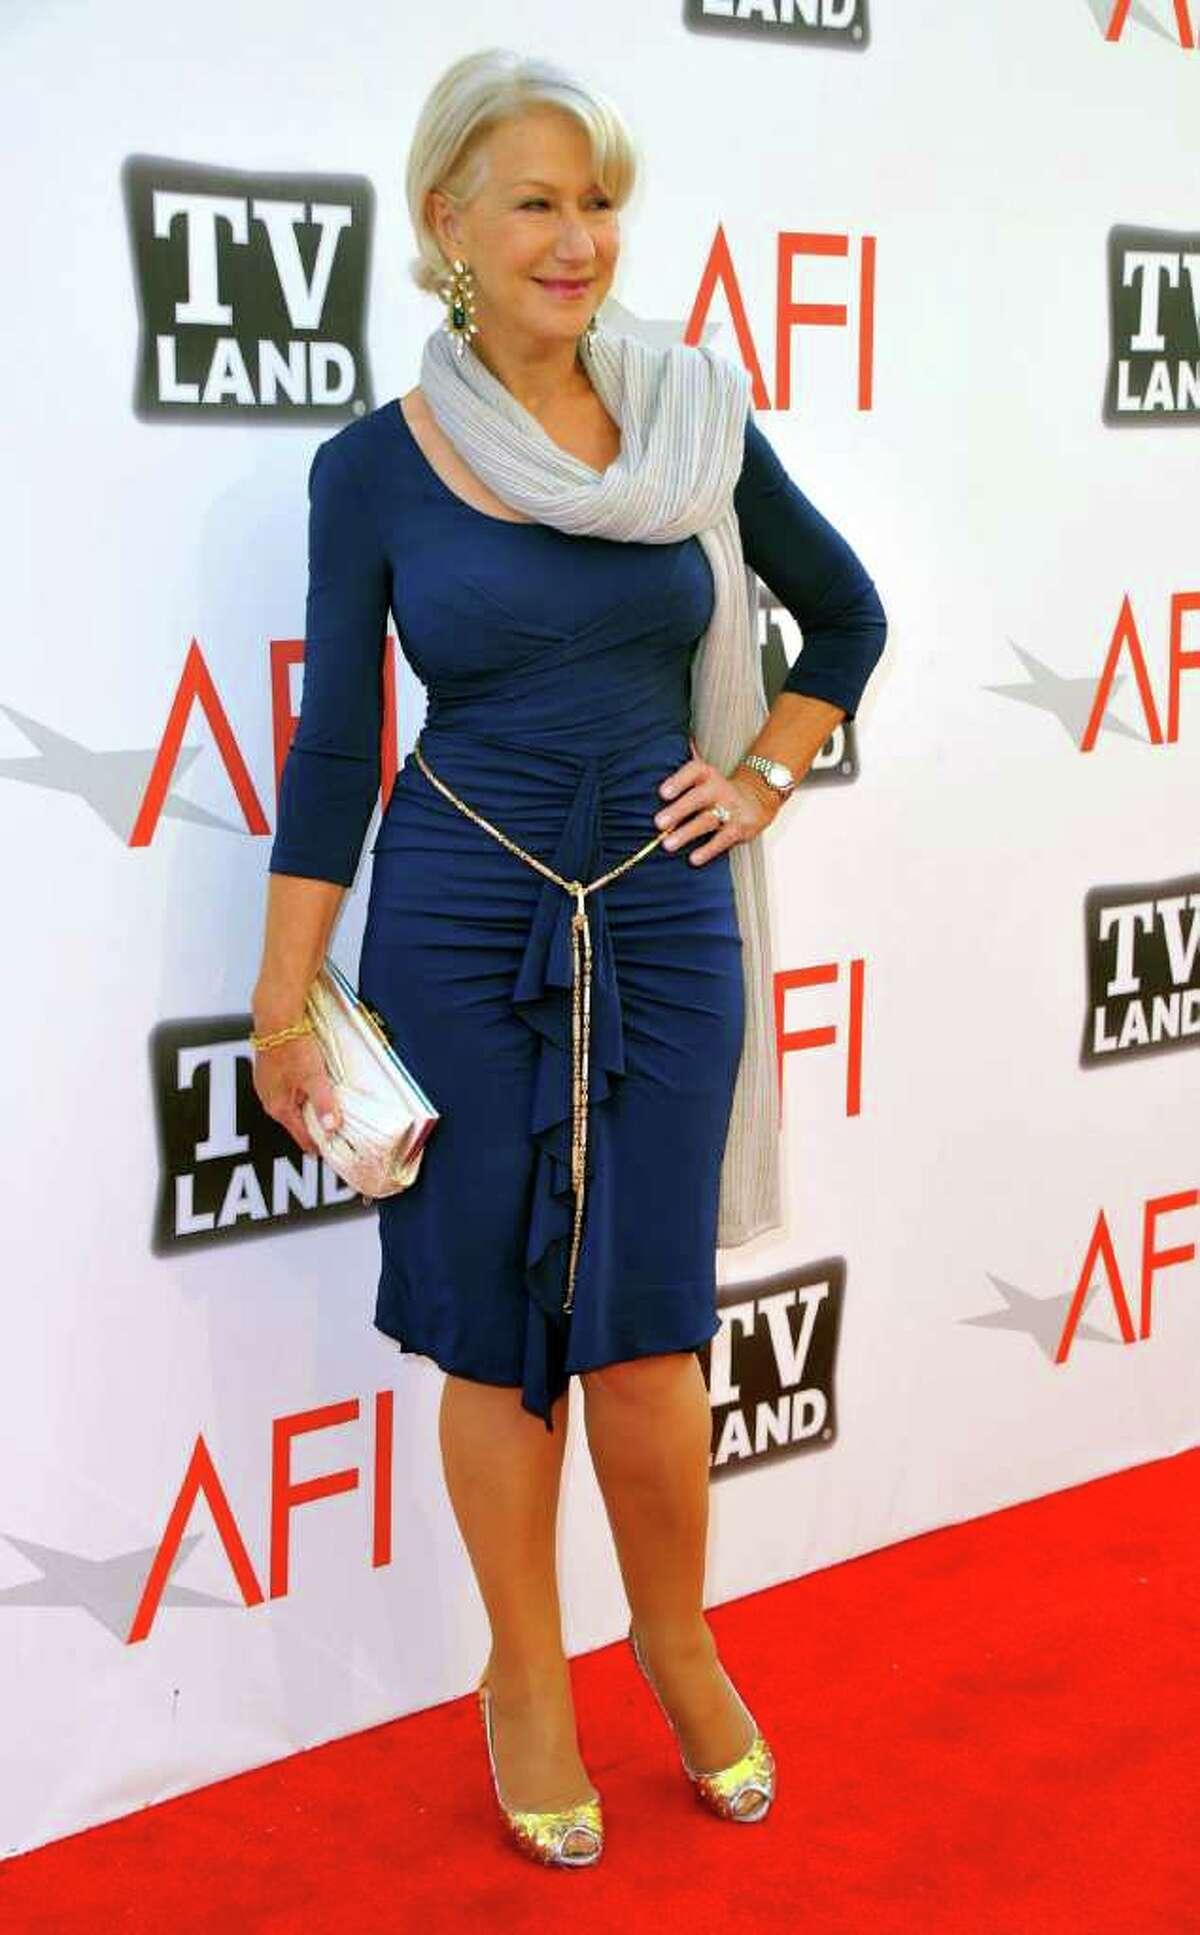 Helen Mirren, 66, was voted the top